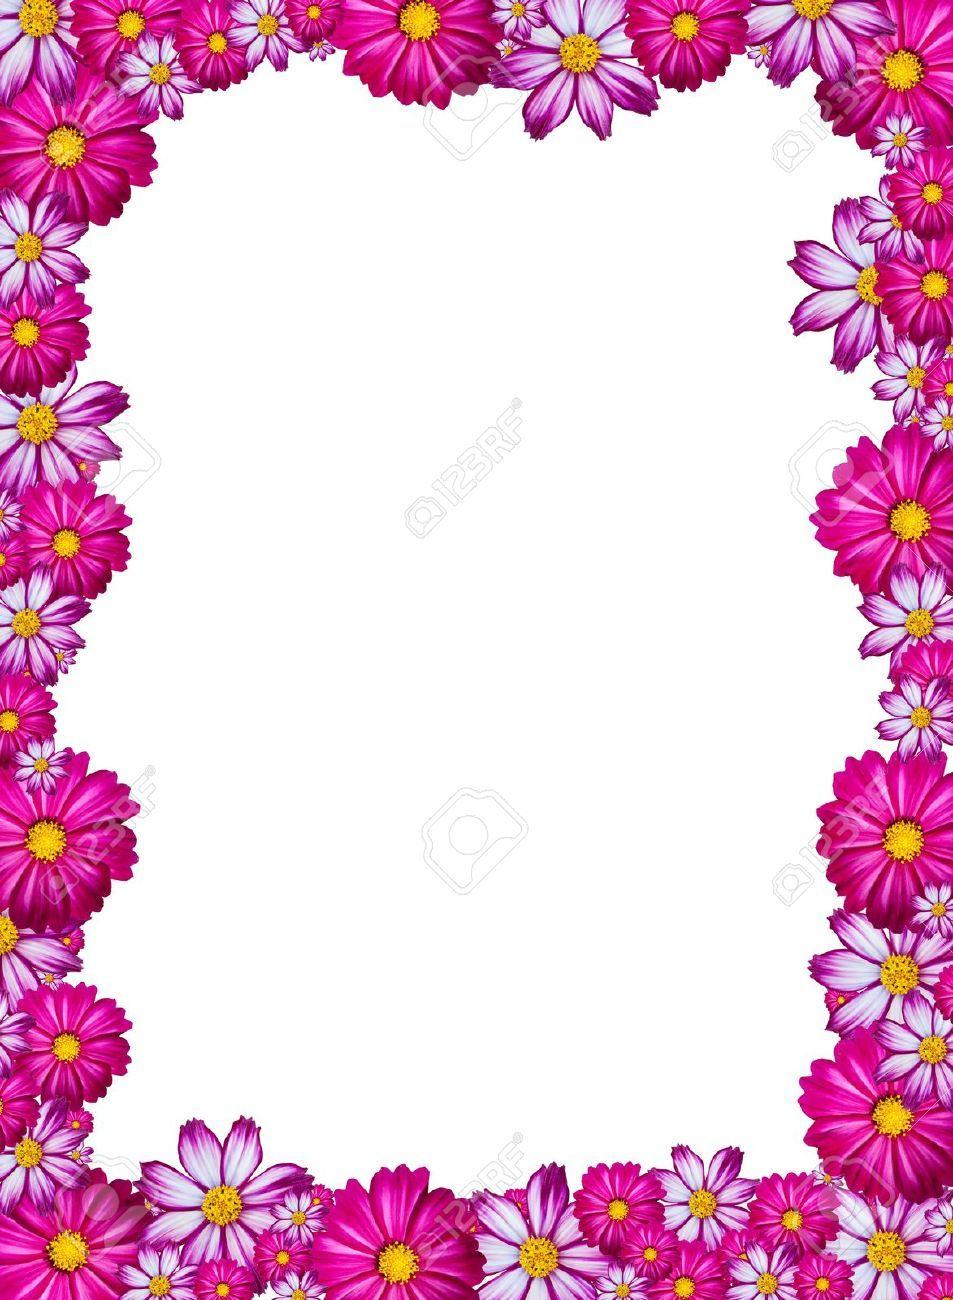 resultado de imagen para marco de flores fucsia marcos lindos pinterest searching. Black Bedroom Furniture Sets. Home Design Ideas